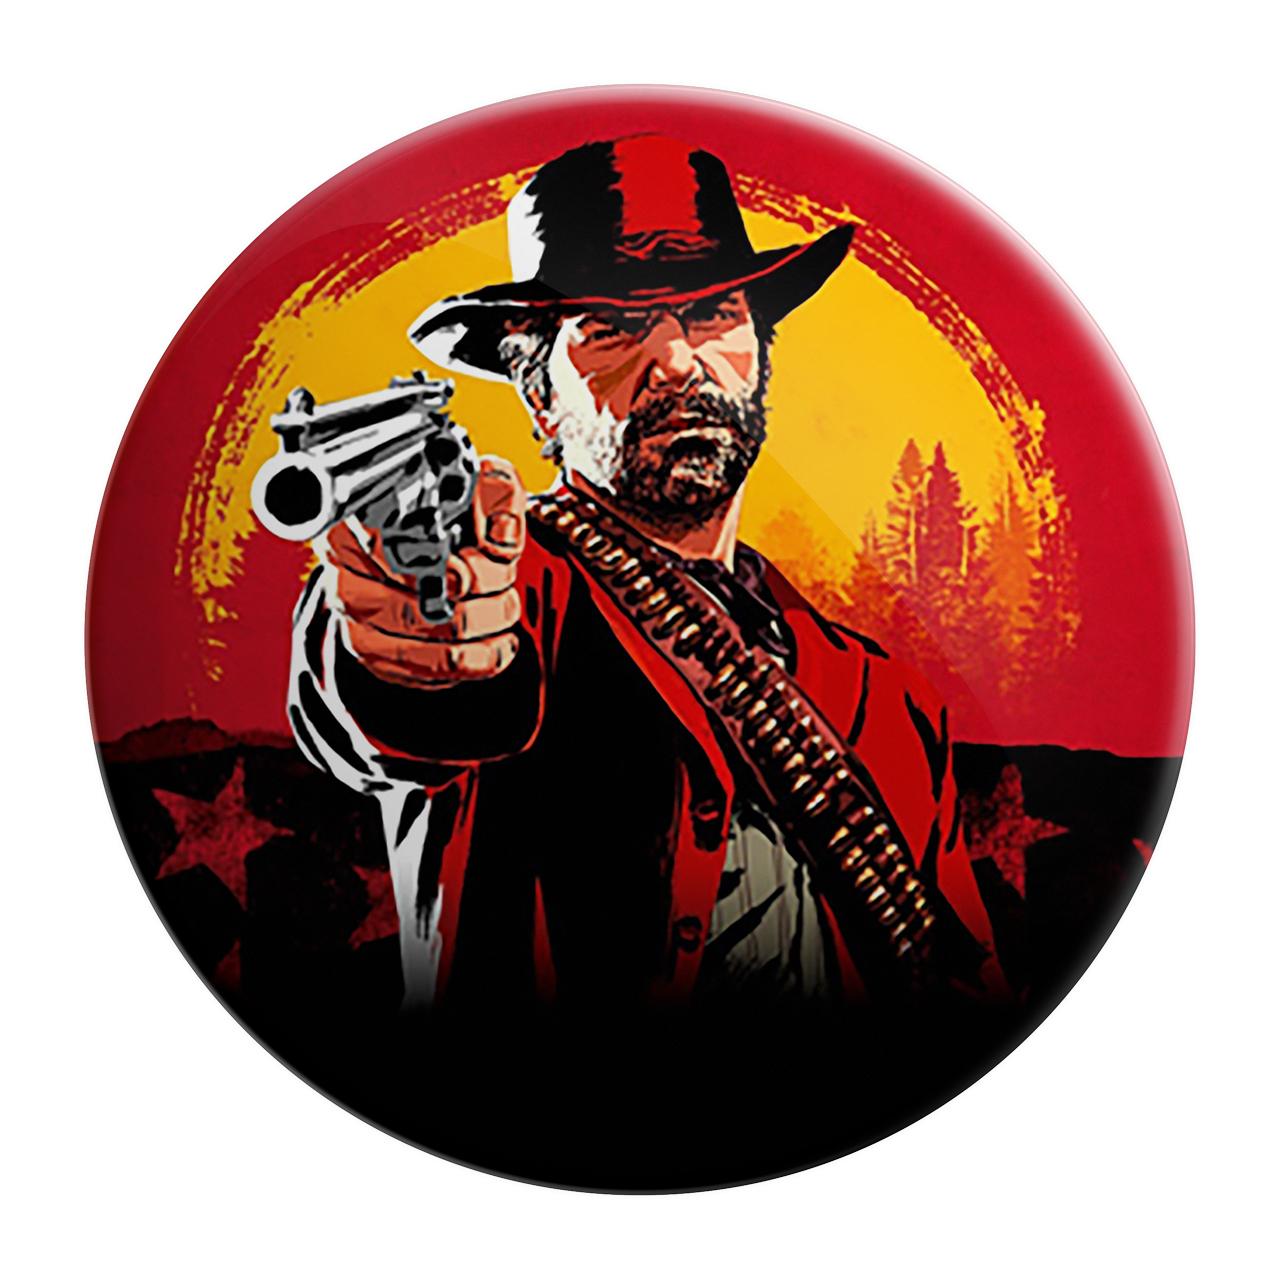 قیمت پیکسل طرح Red Dead کد C601